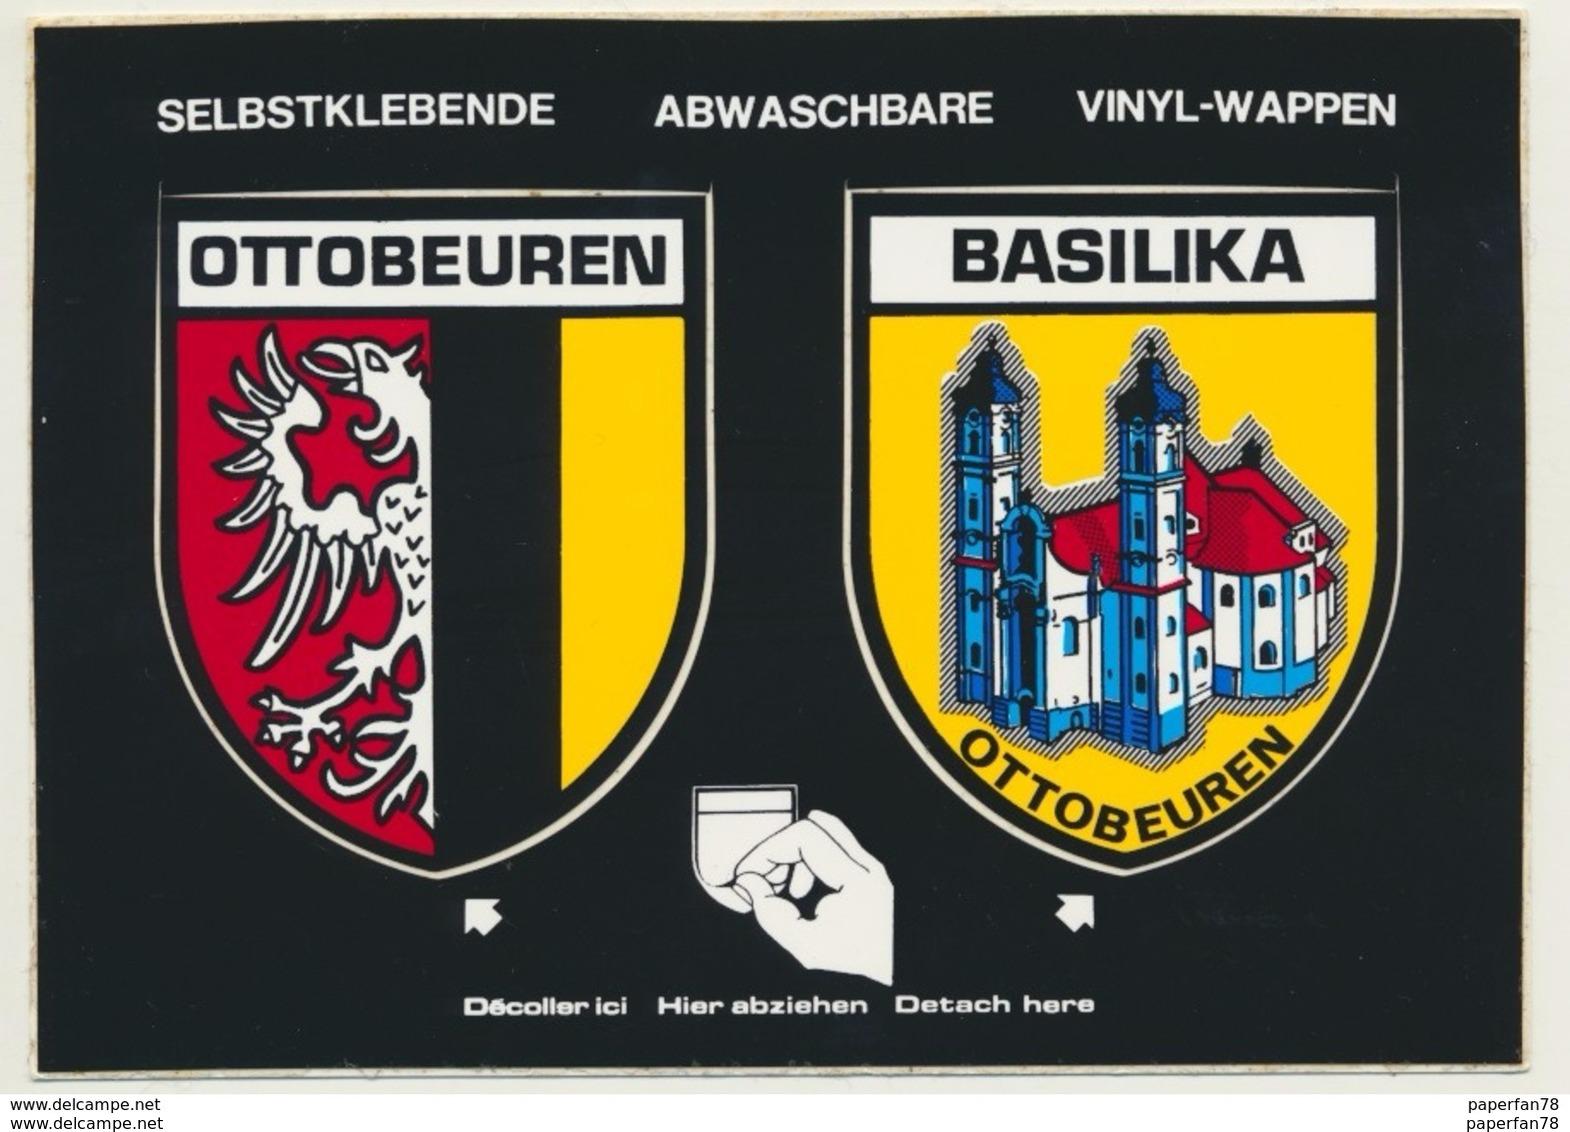 Sticker Aufkleber Autocollant Ottobeuren Und Basilika Wappen - Autocollants